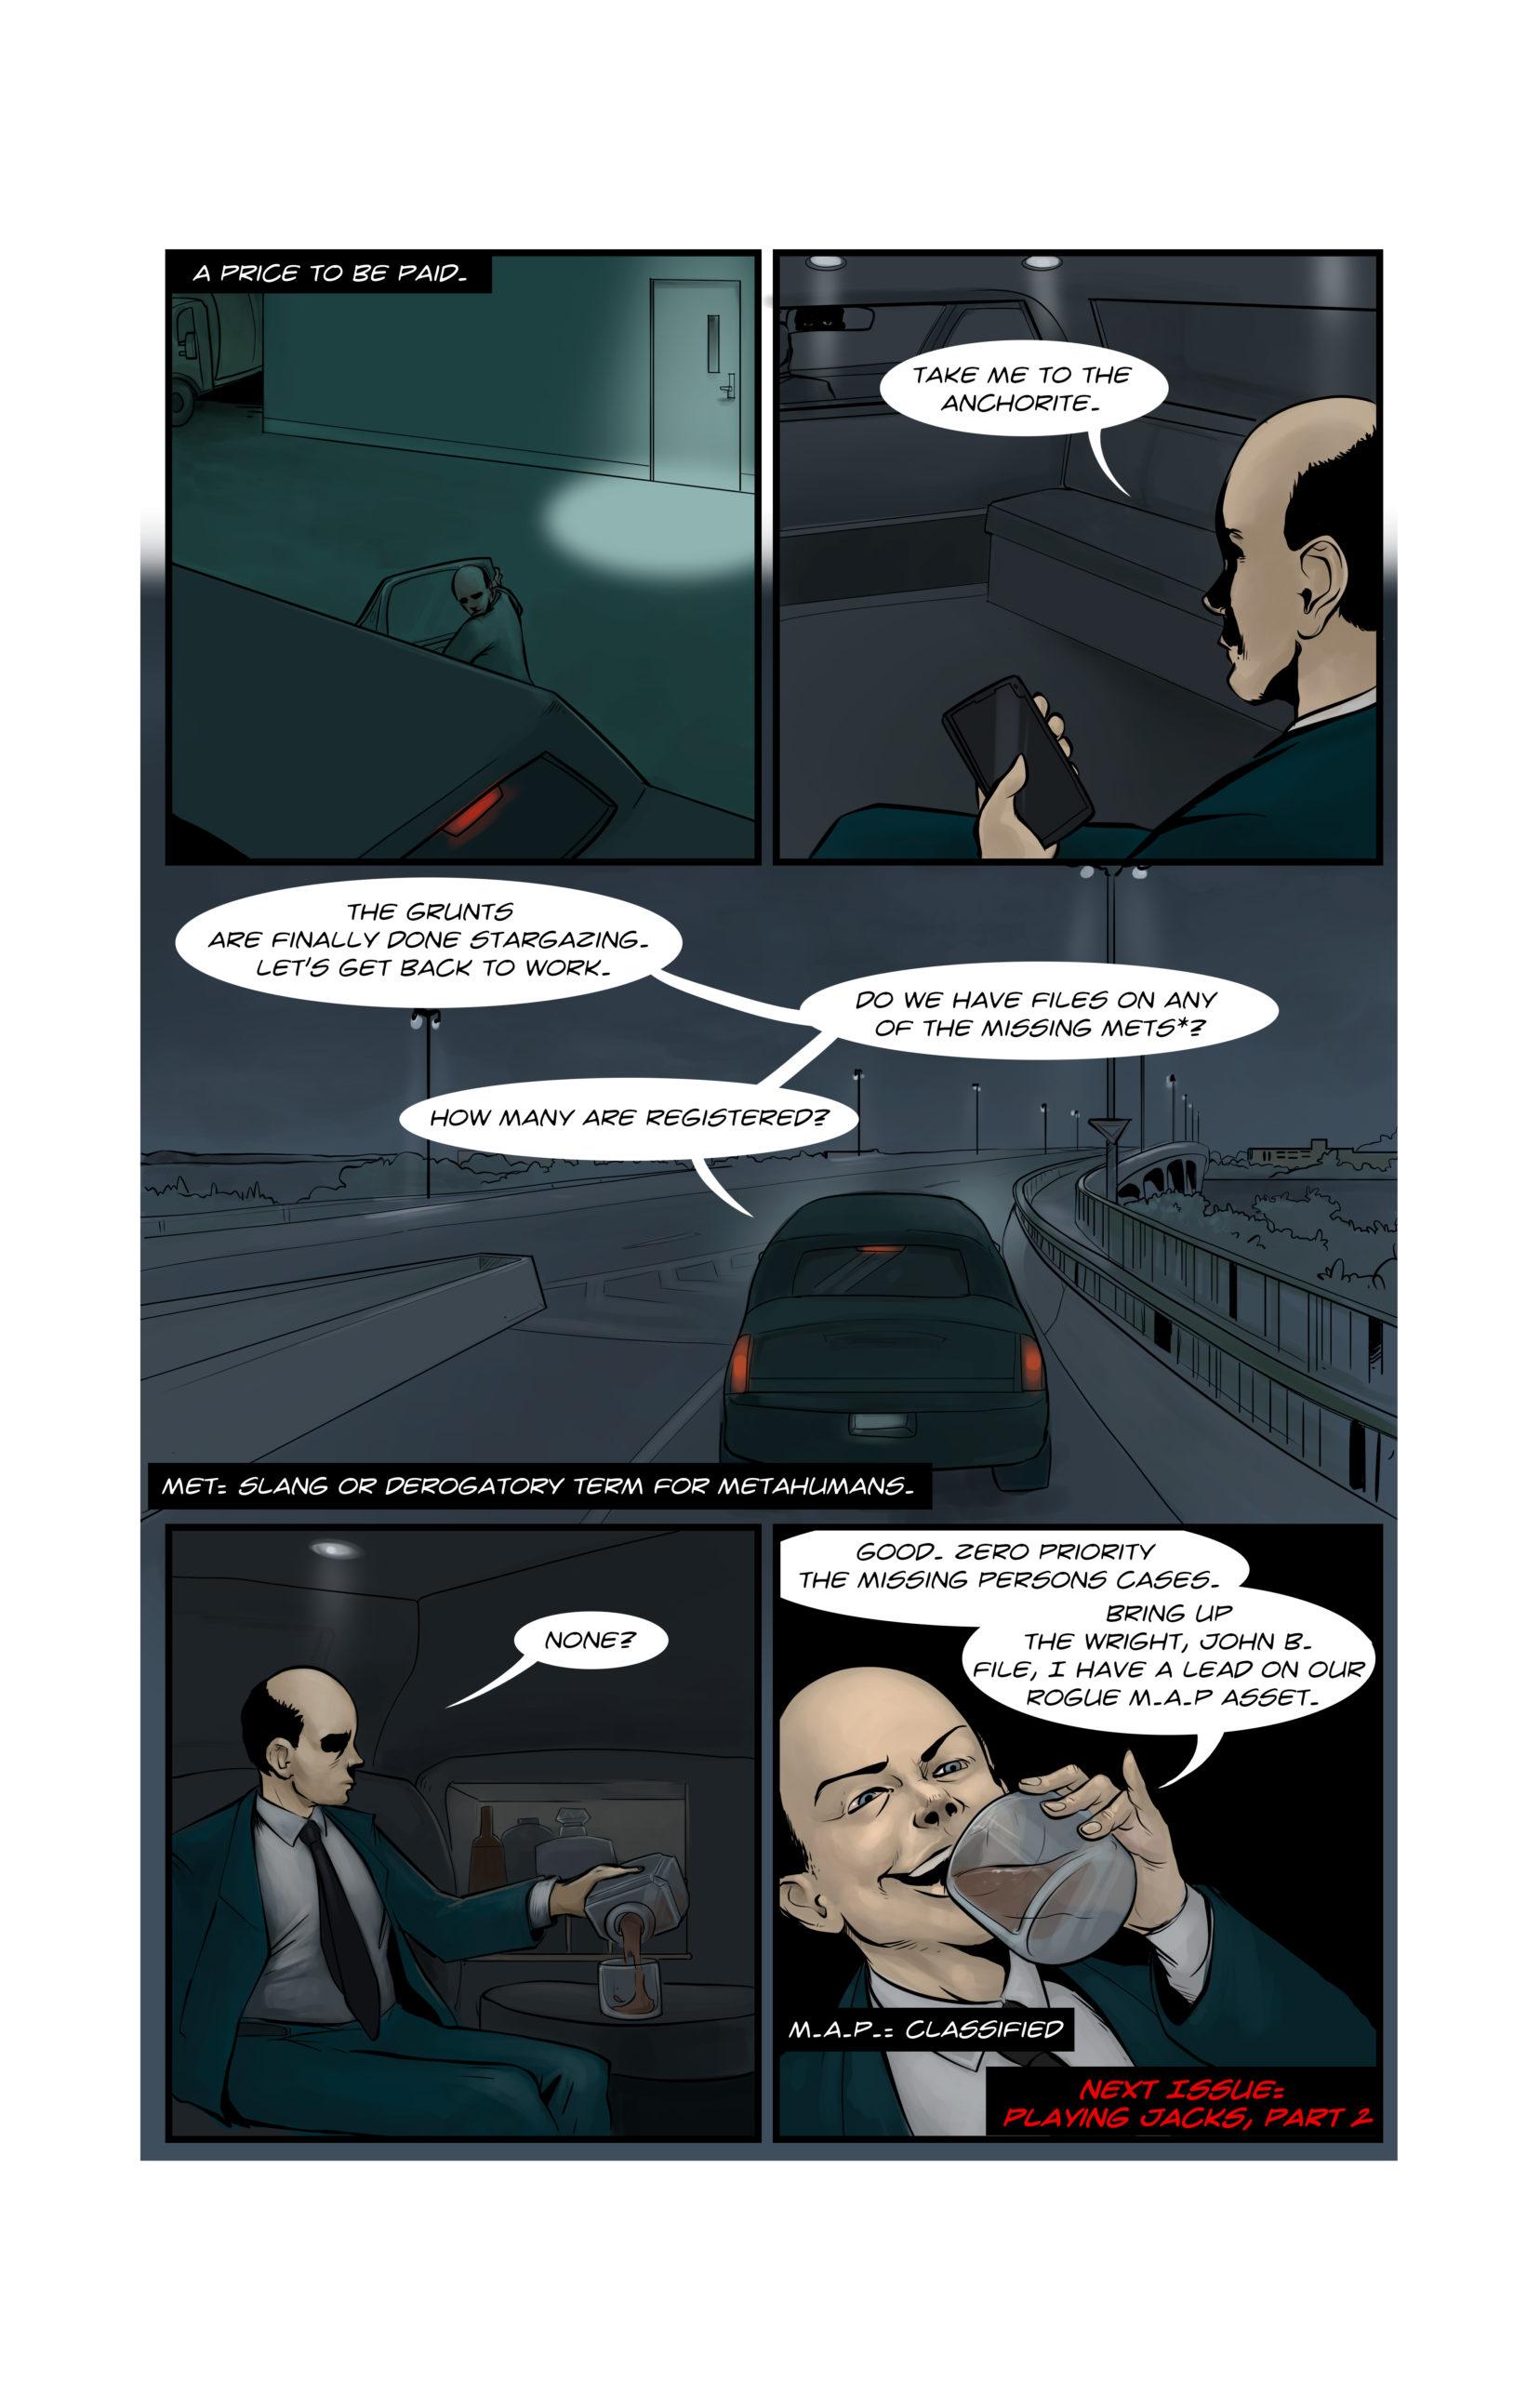 Playing Jacks, Page 23